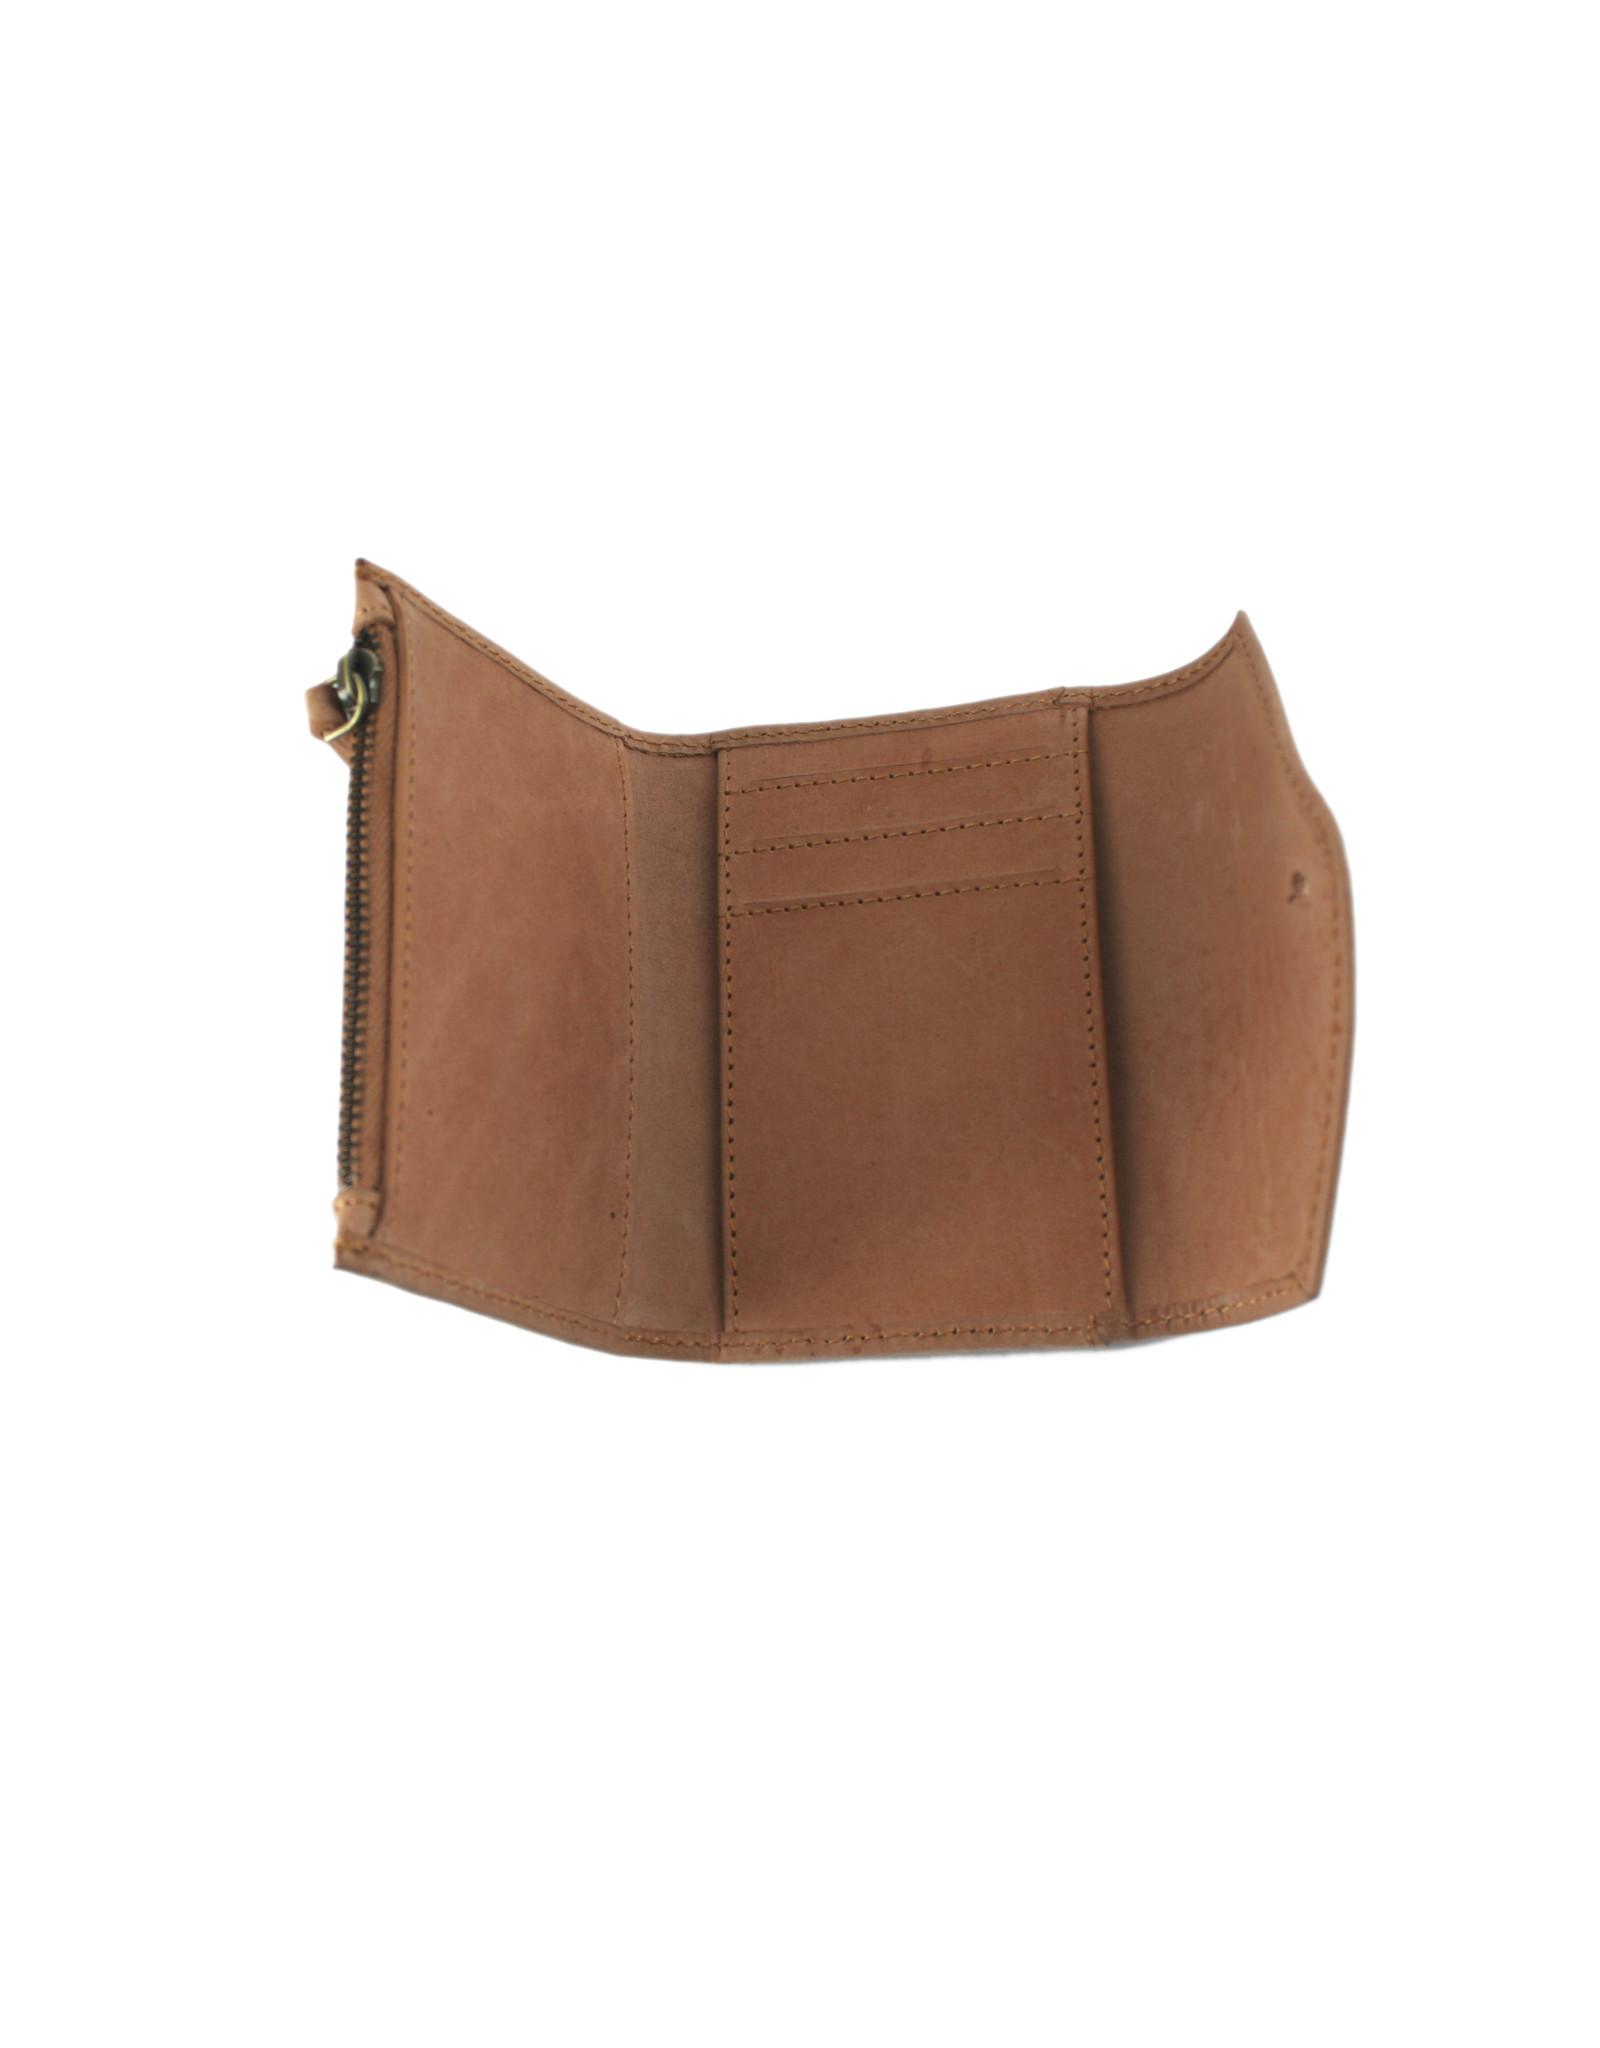 O MY BAG Josie's Purse